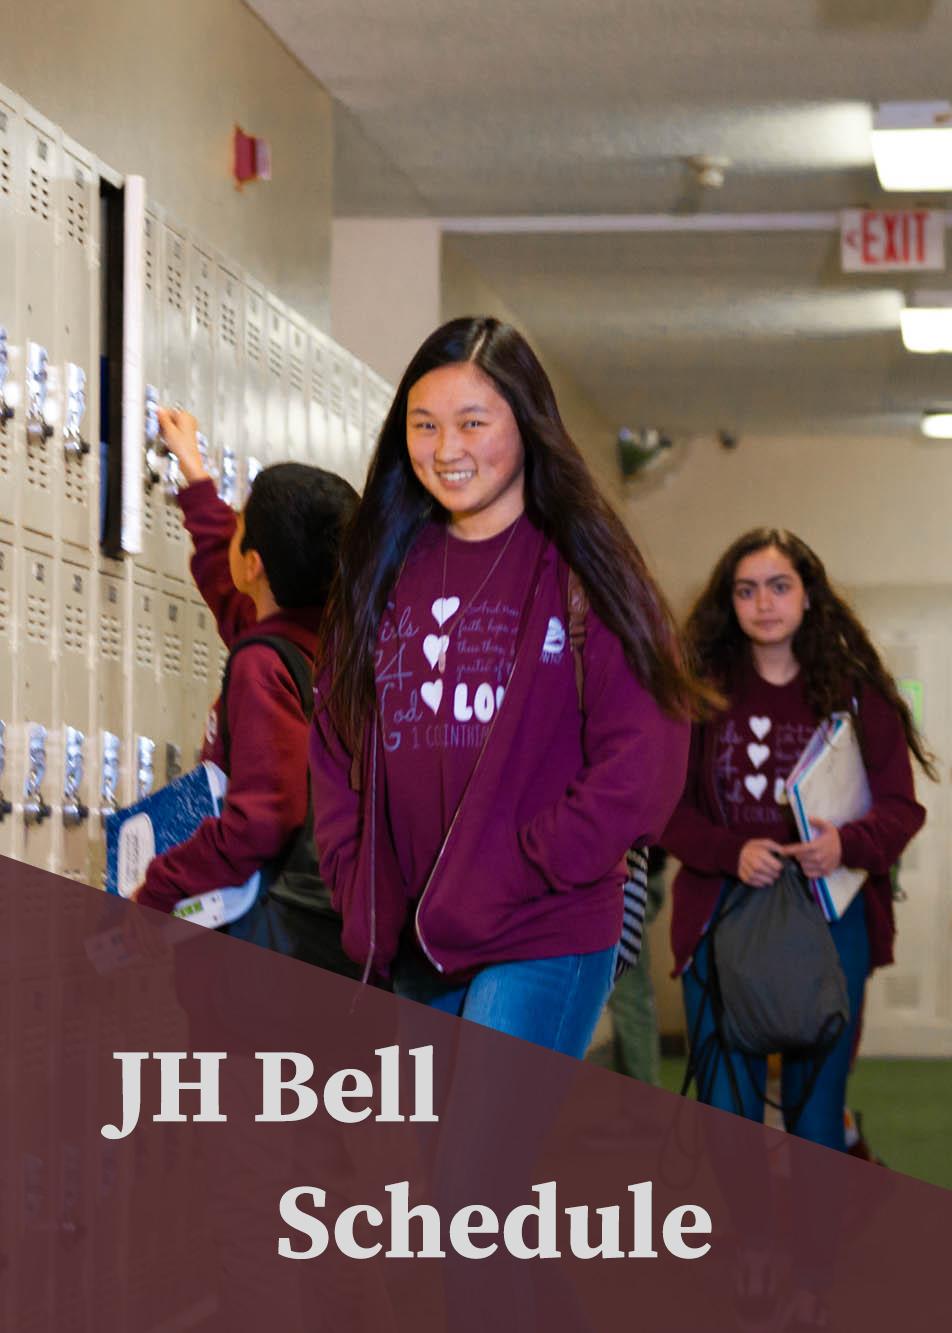 JH Bell Schedule